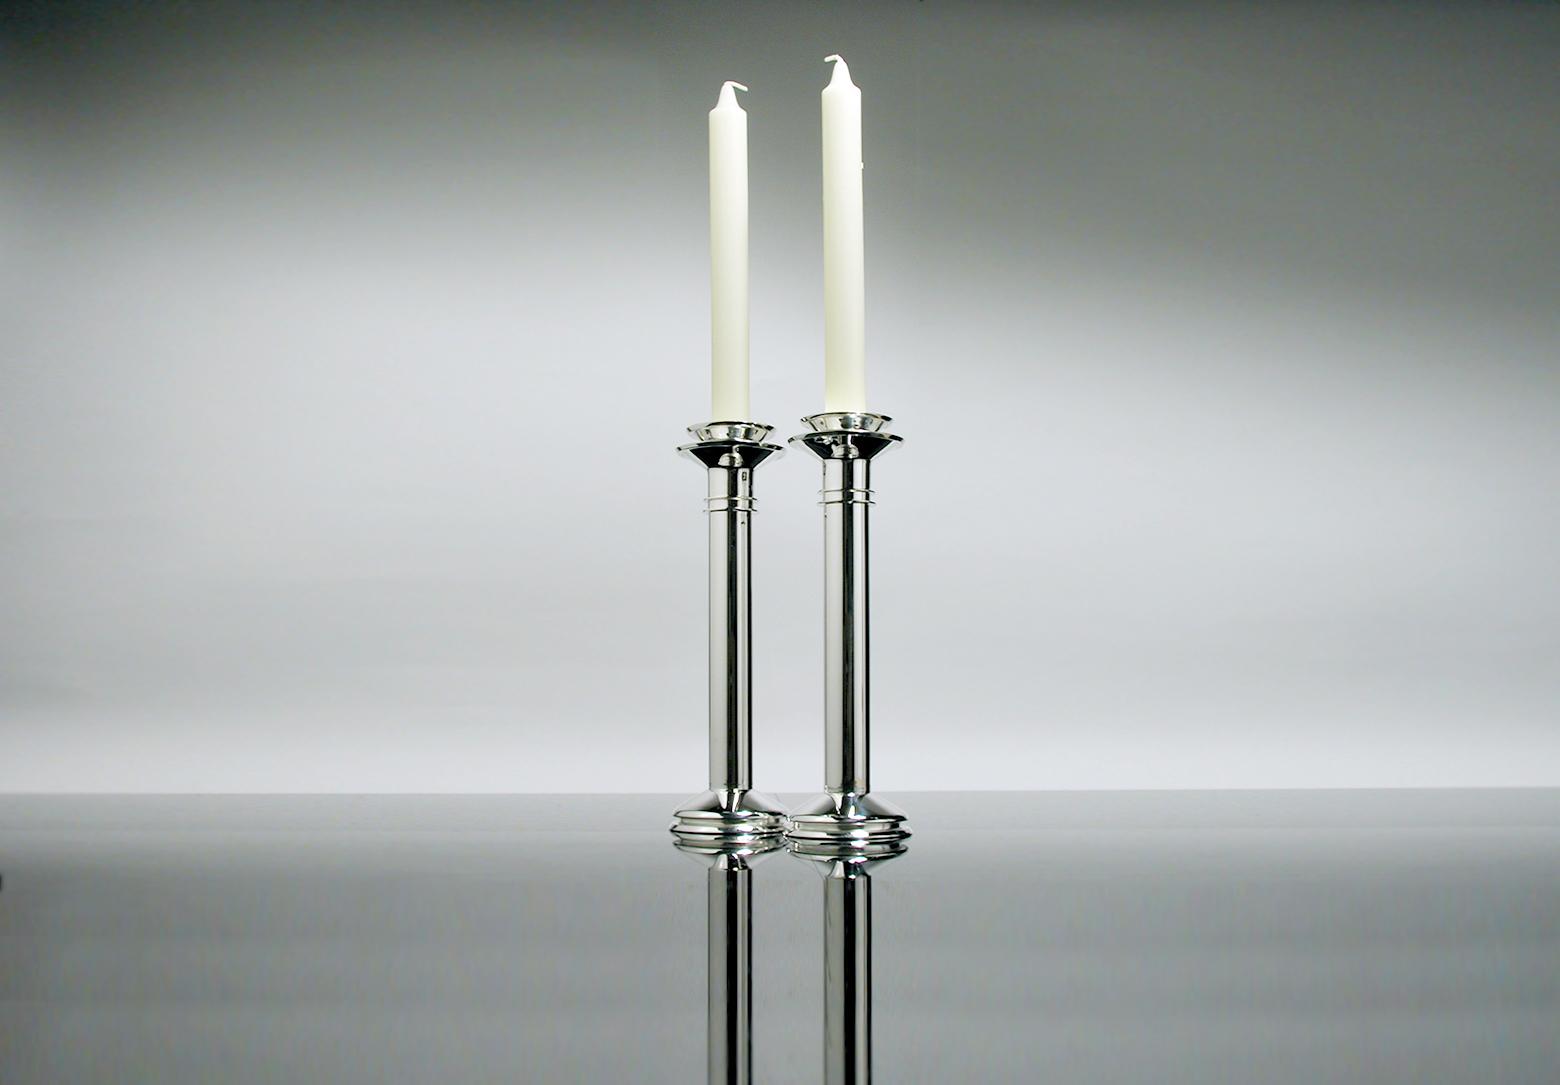 contemporary silverware - deco candlestickstall contemporary silverware by martyn pugh